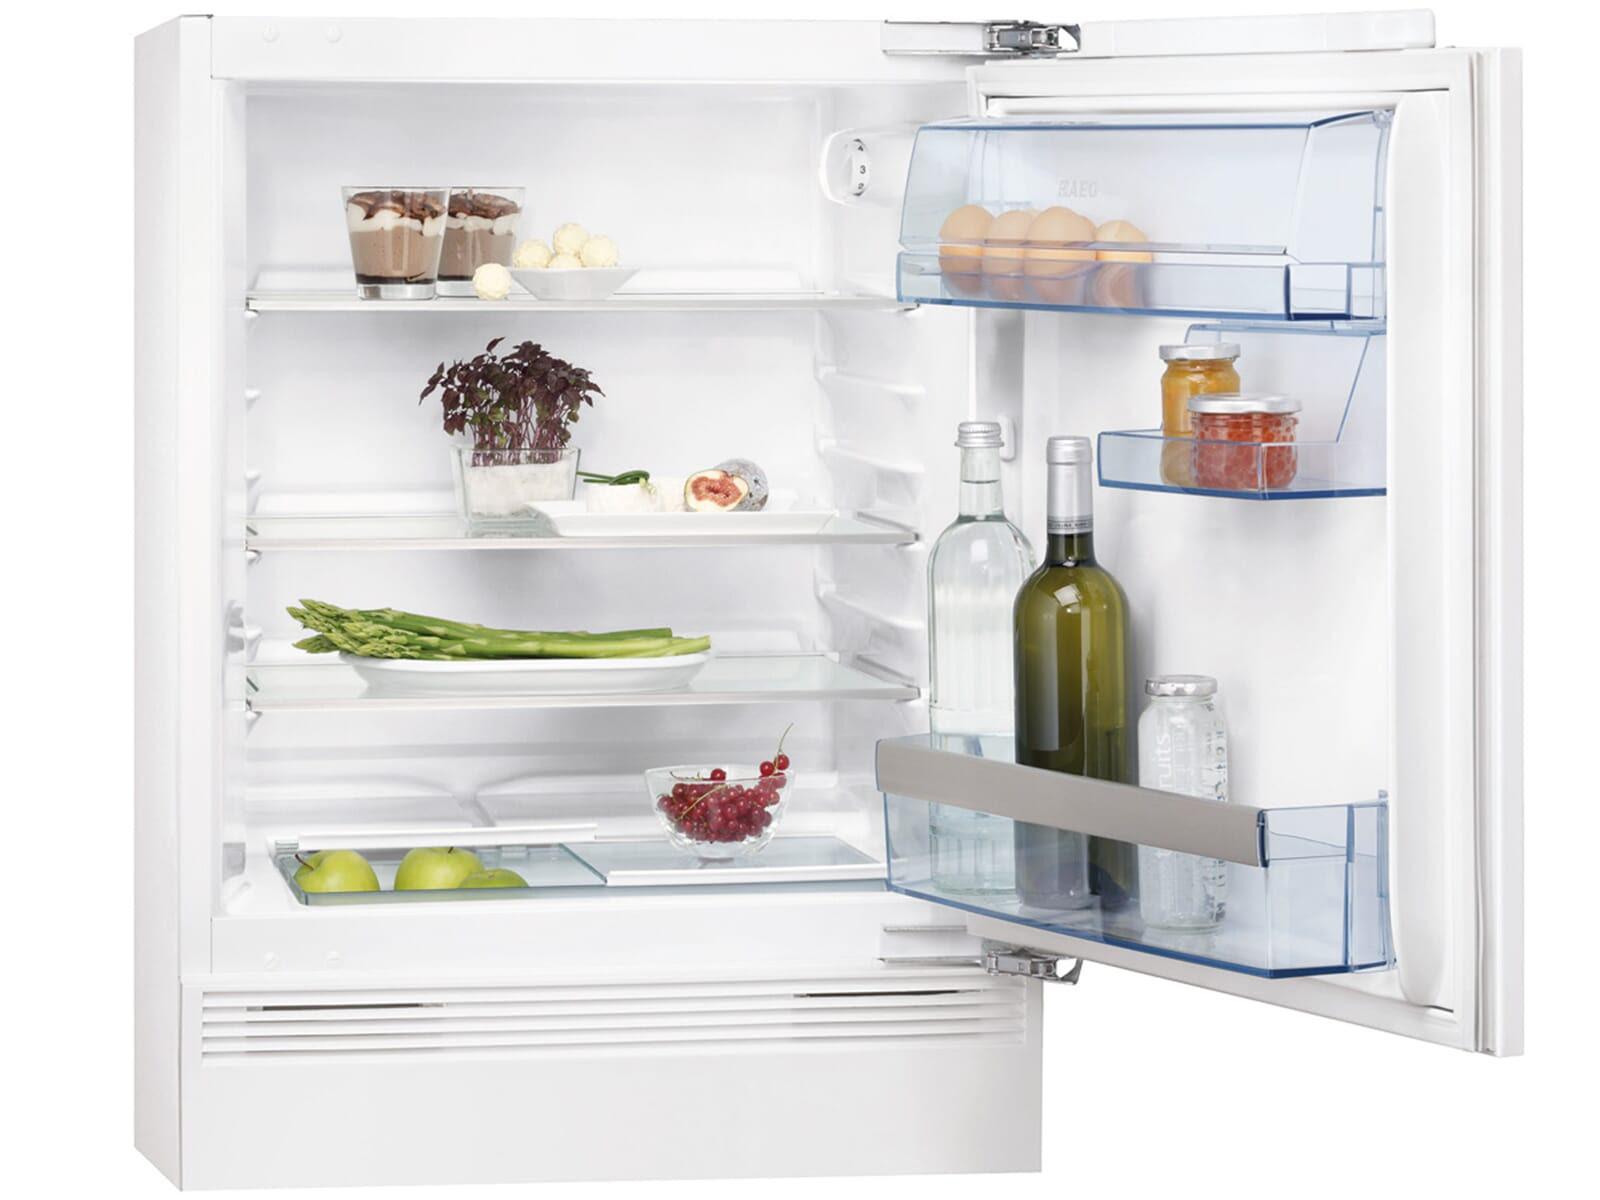 Retro Kühlschrank Pkm : Unterbau kühlschrank maurine morton